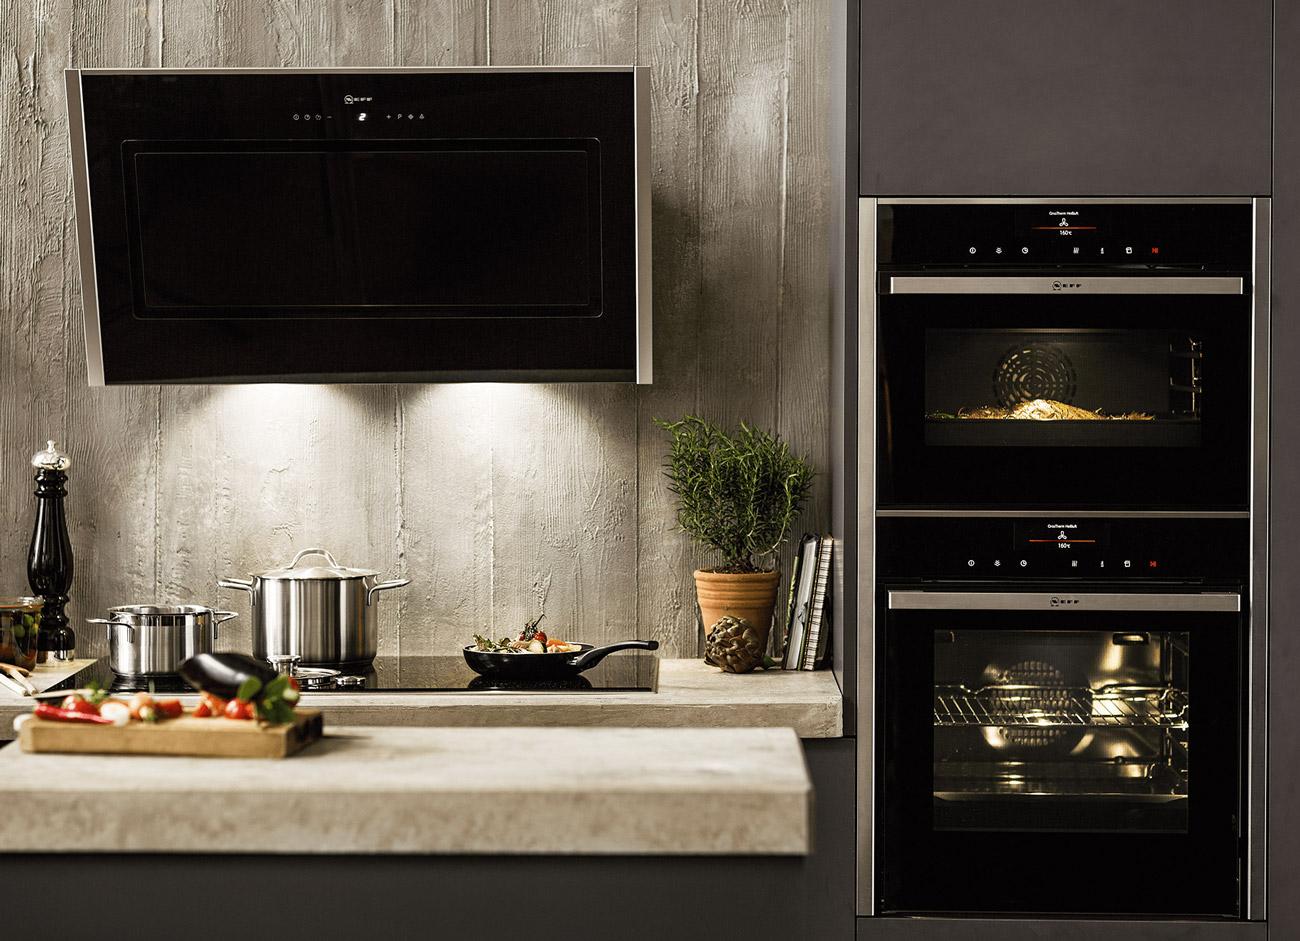 Neff | Slide&Hide | Self-cleaning ovens | Dishwashers | ao.com